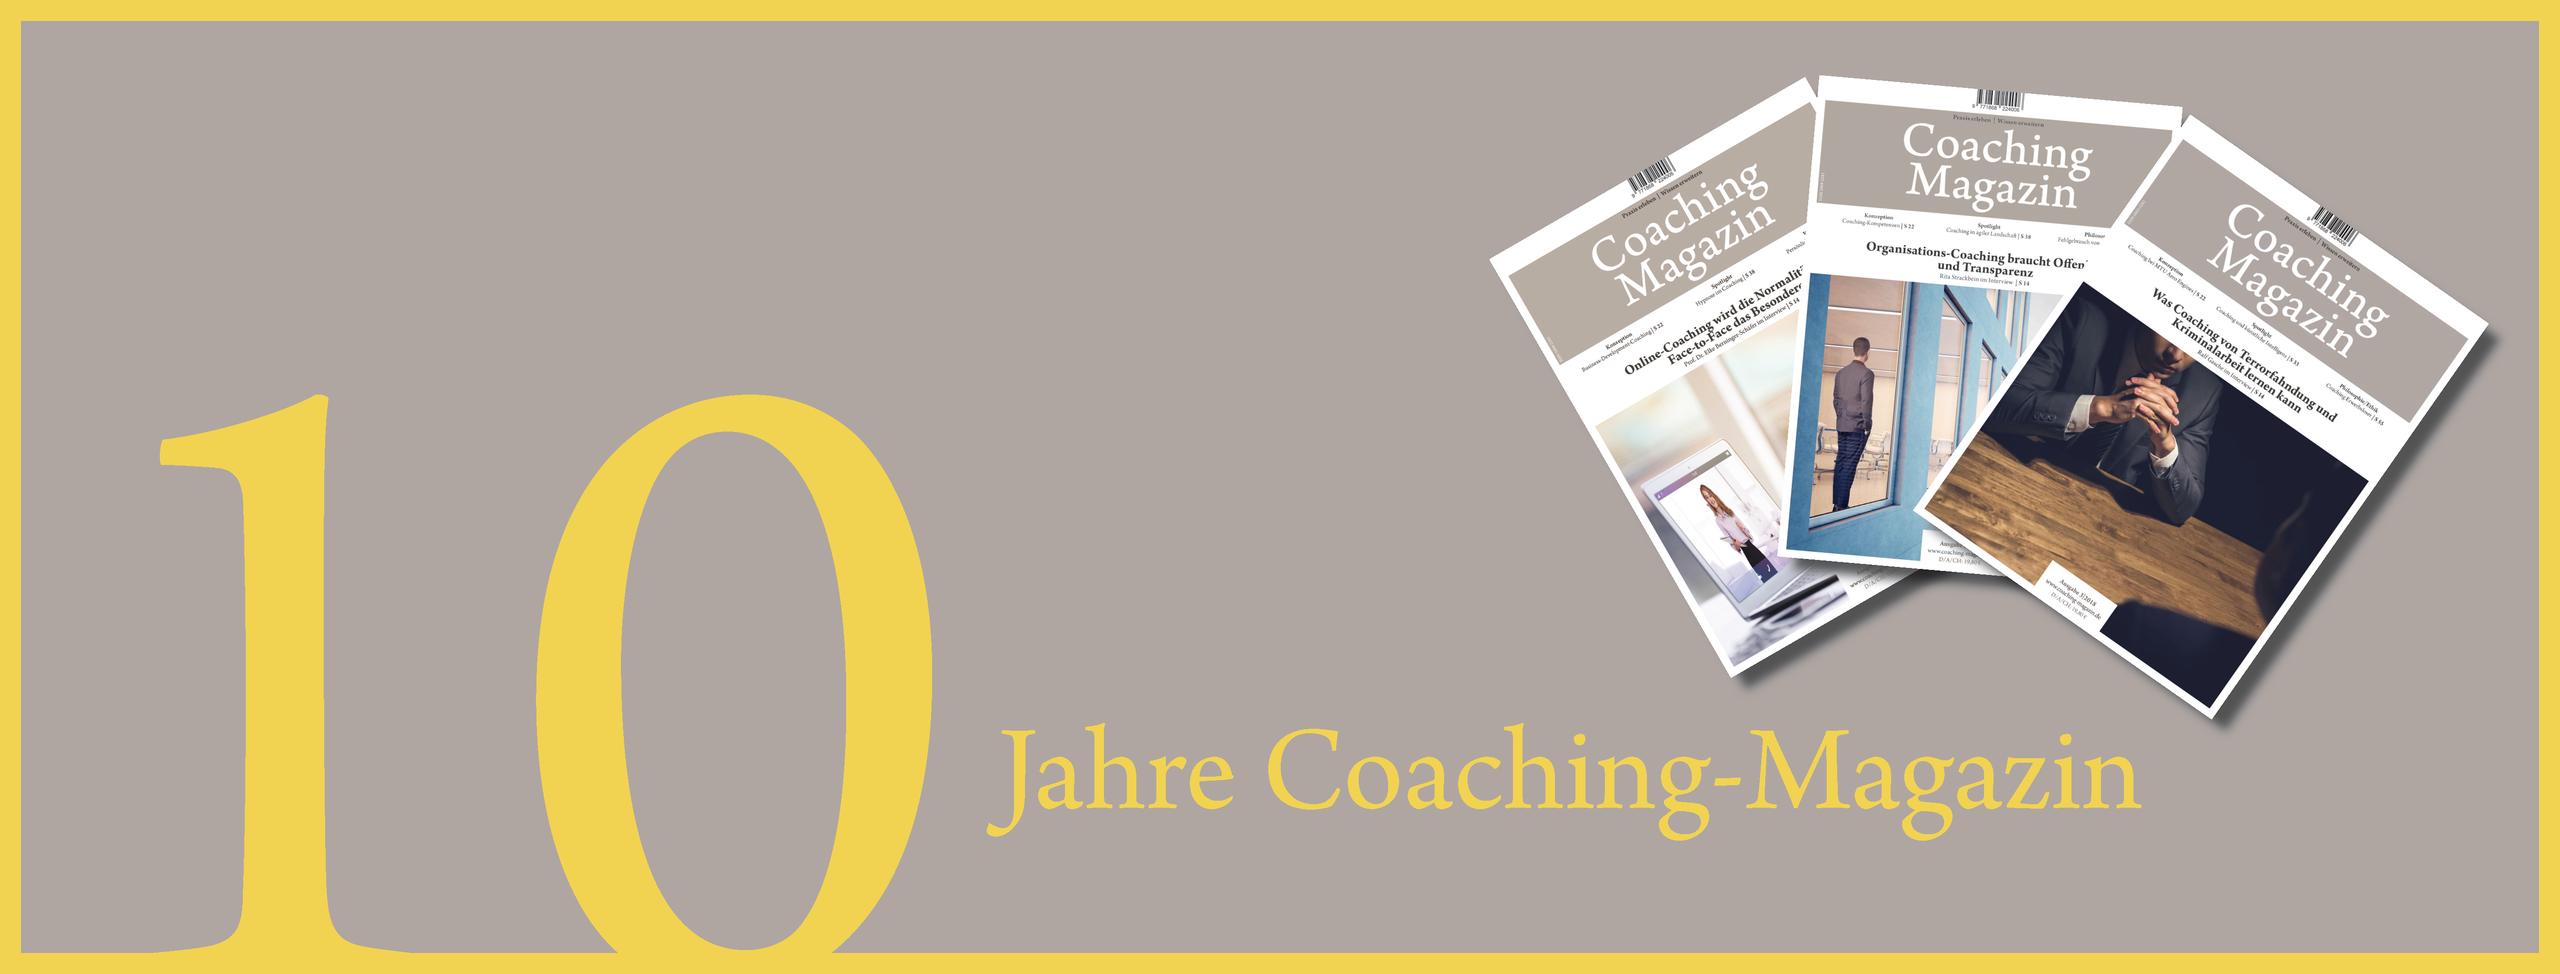 Zehn Jahre Coaching-Magazin